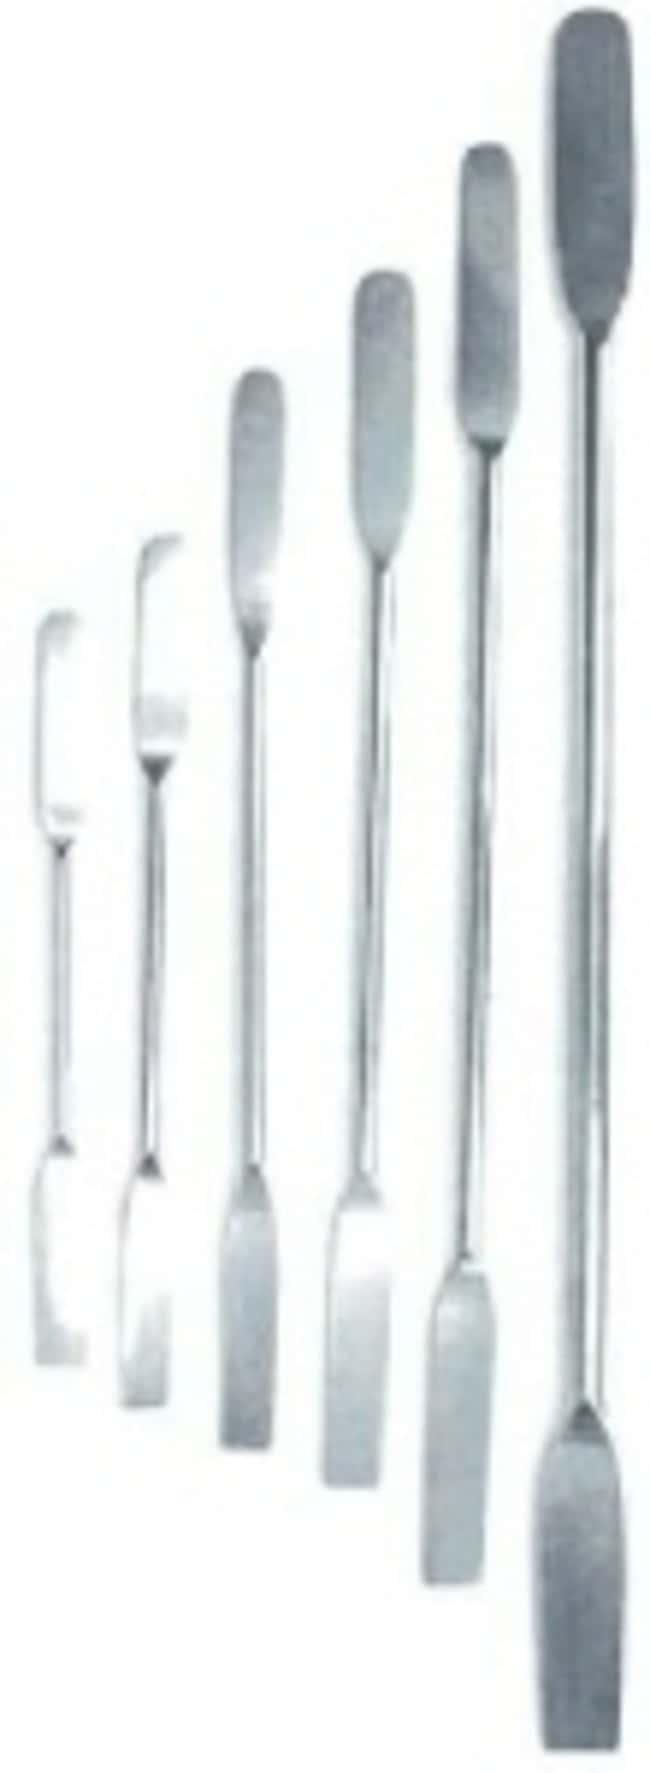 Schneider Gerd™Double spatule Length: 130mm Schneider Gerd™Double spatule